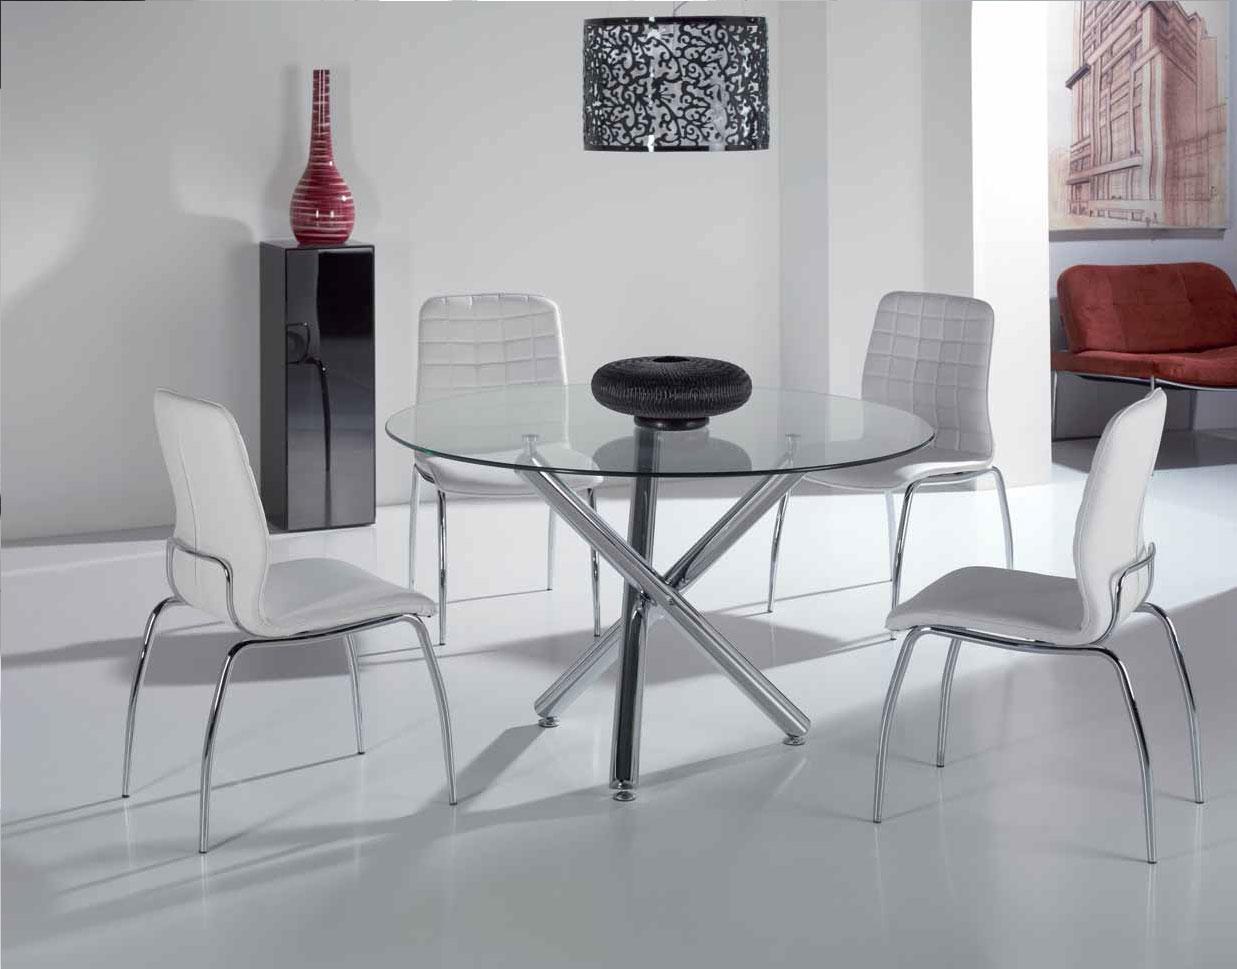 Mia home mesa de comedor redonda 417 g silla 119 for Mesa rinconera comedor